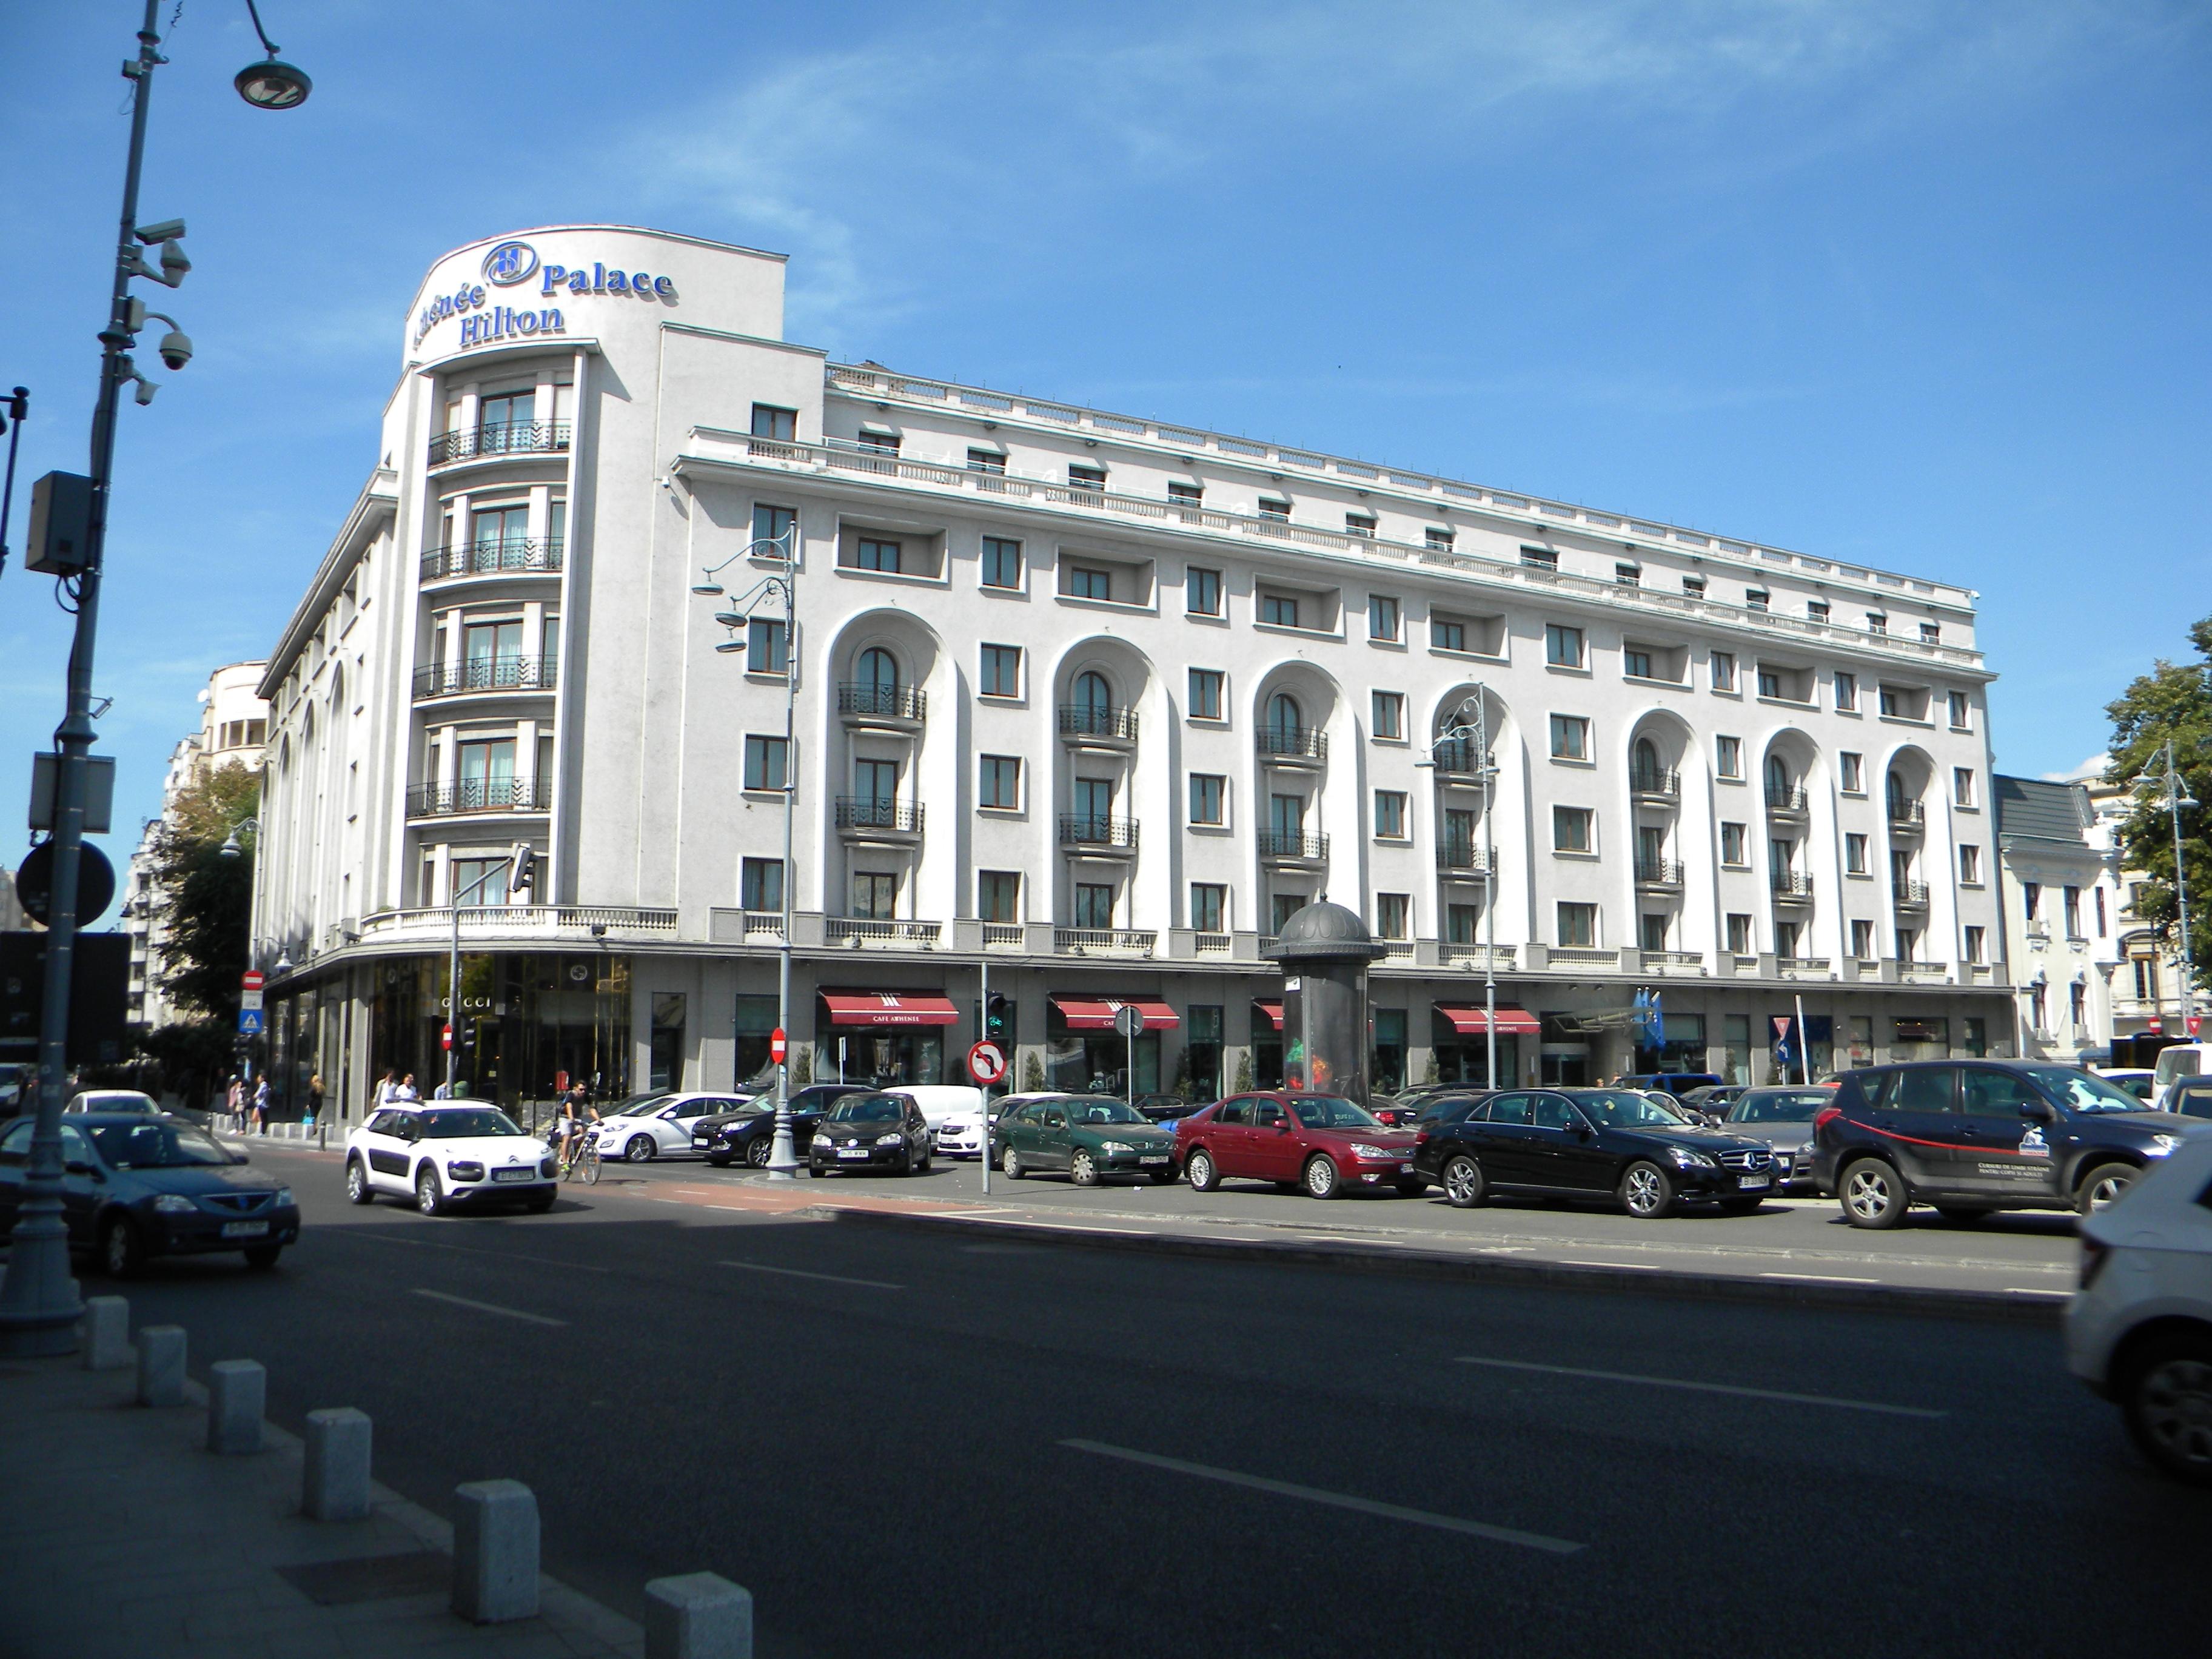 Hotel Athenee Palace Campofelice Di Roccella